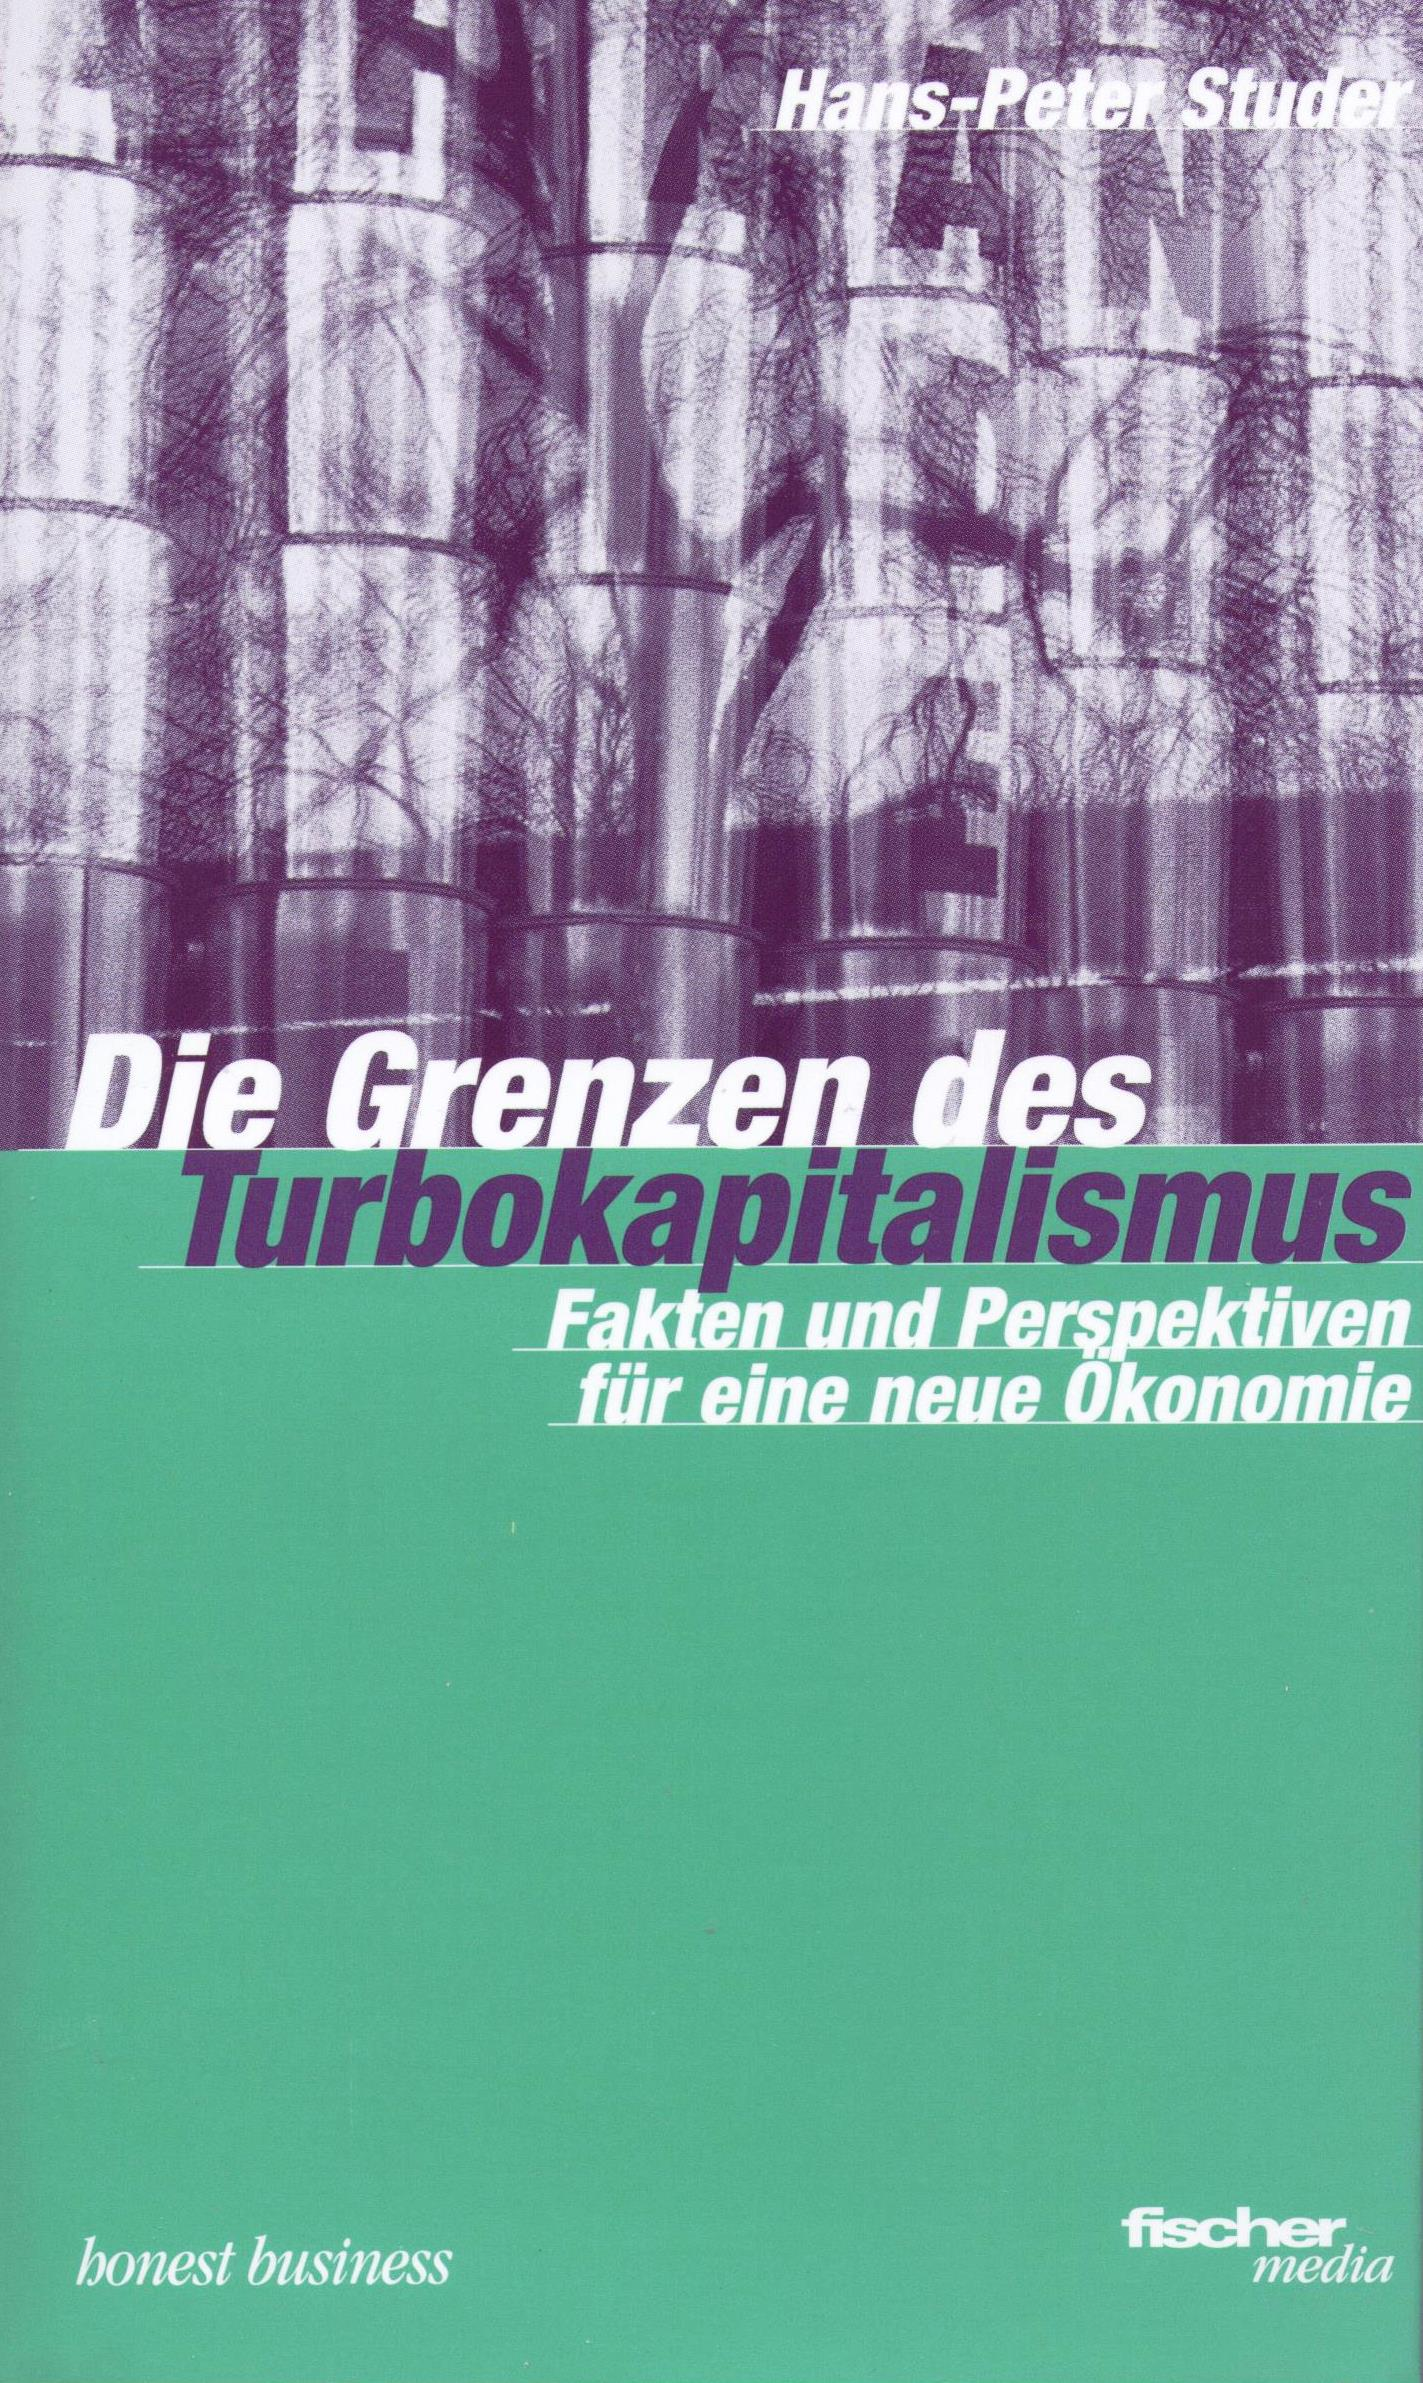 buchcover-turbokapitalismus